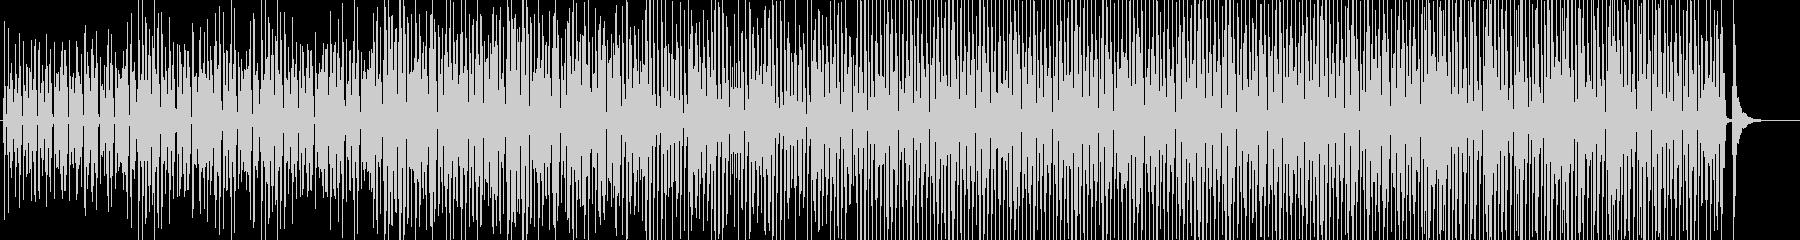 Youtube-日常-ウクレレ-かわいいの未再生の波形